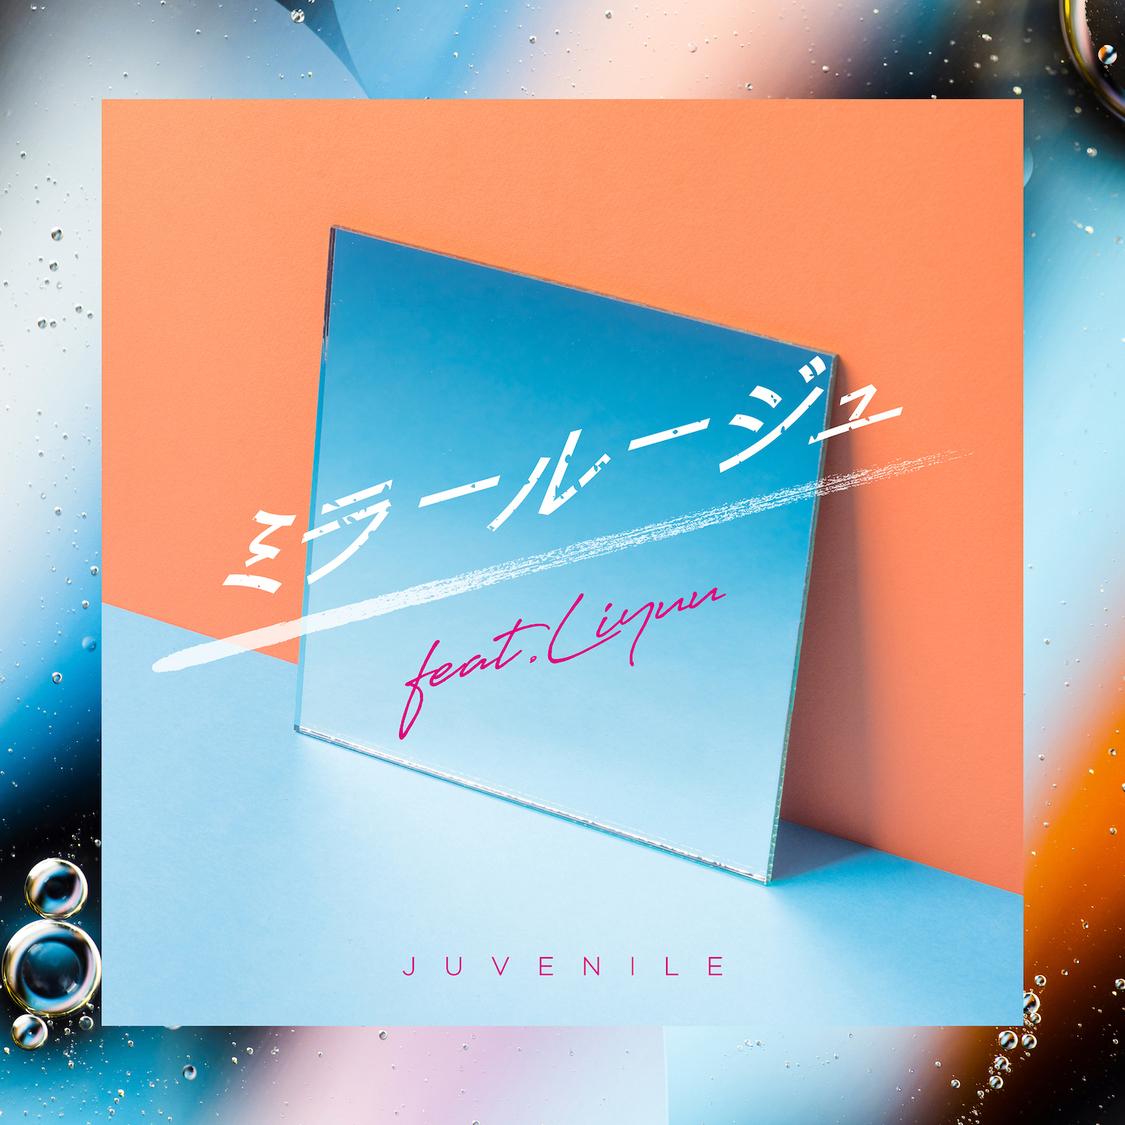 JUVENILE「ミラールージュ feat. Liyuu」